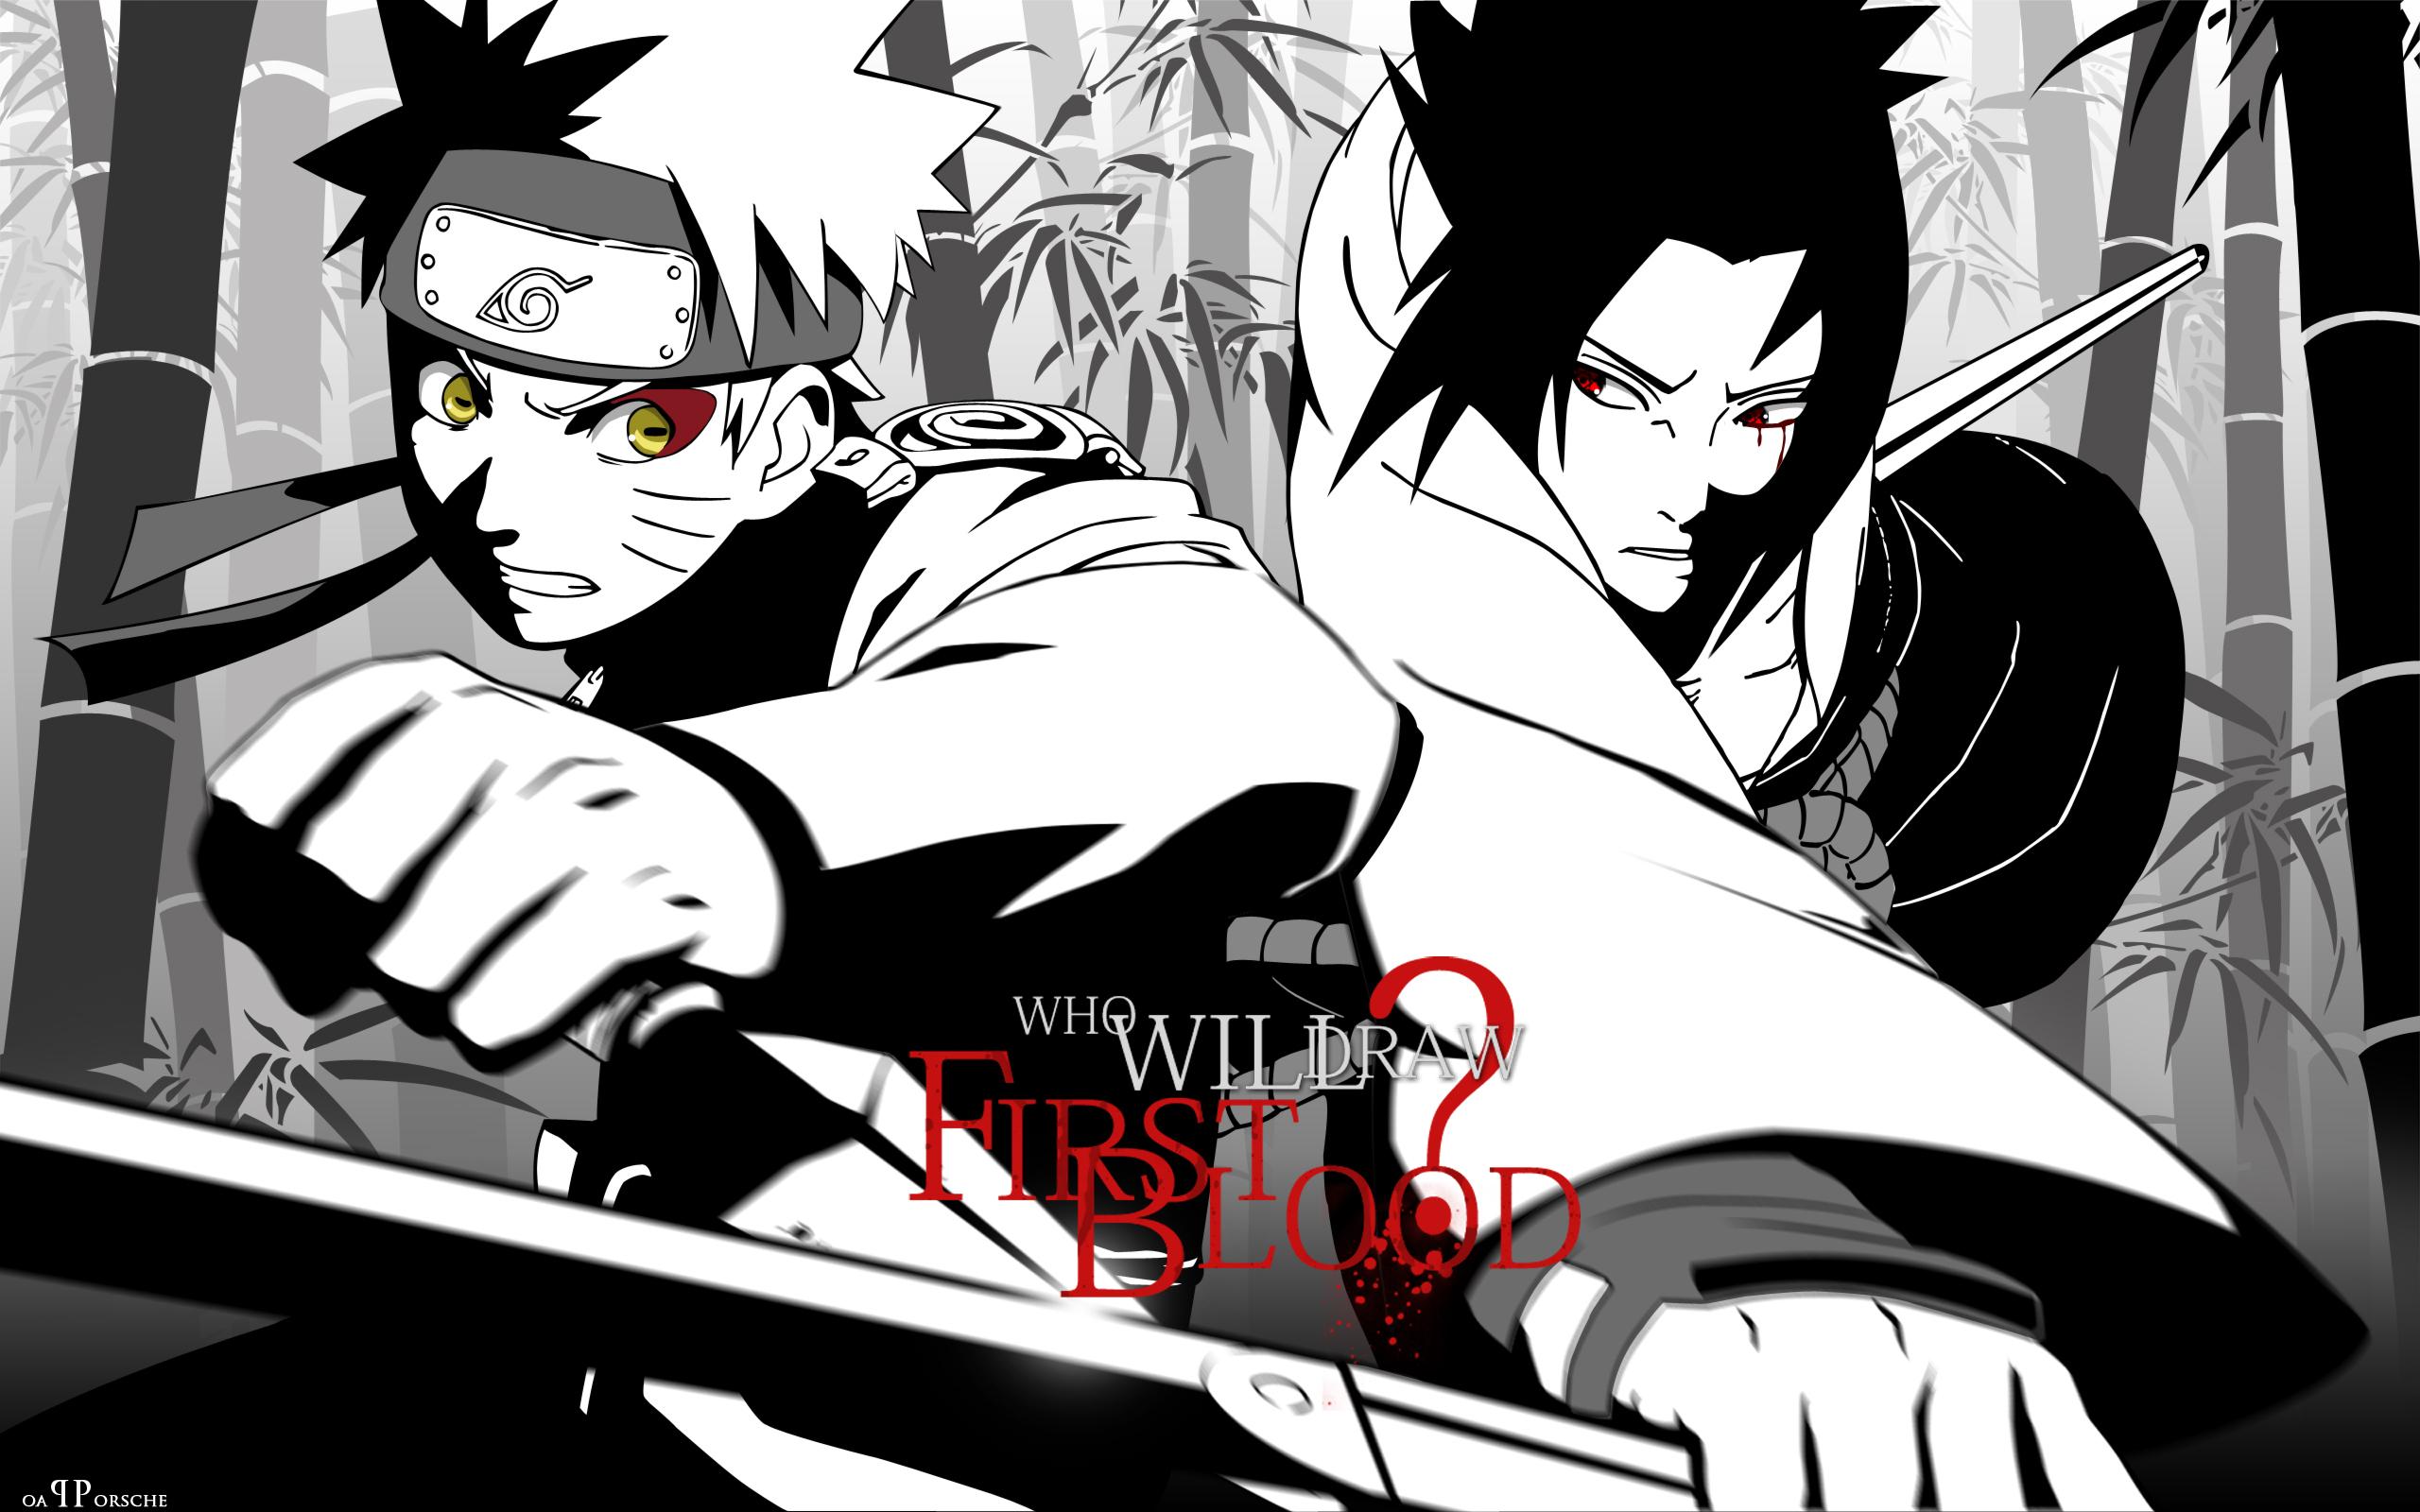 Naruto Shippuuden images Naruto vs Sasuke wallpaper photos 19942440 2560x1600